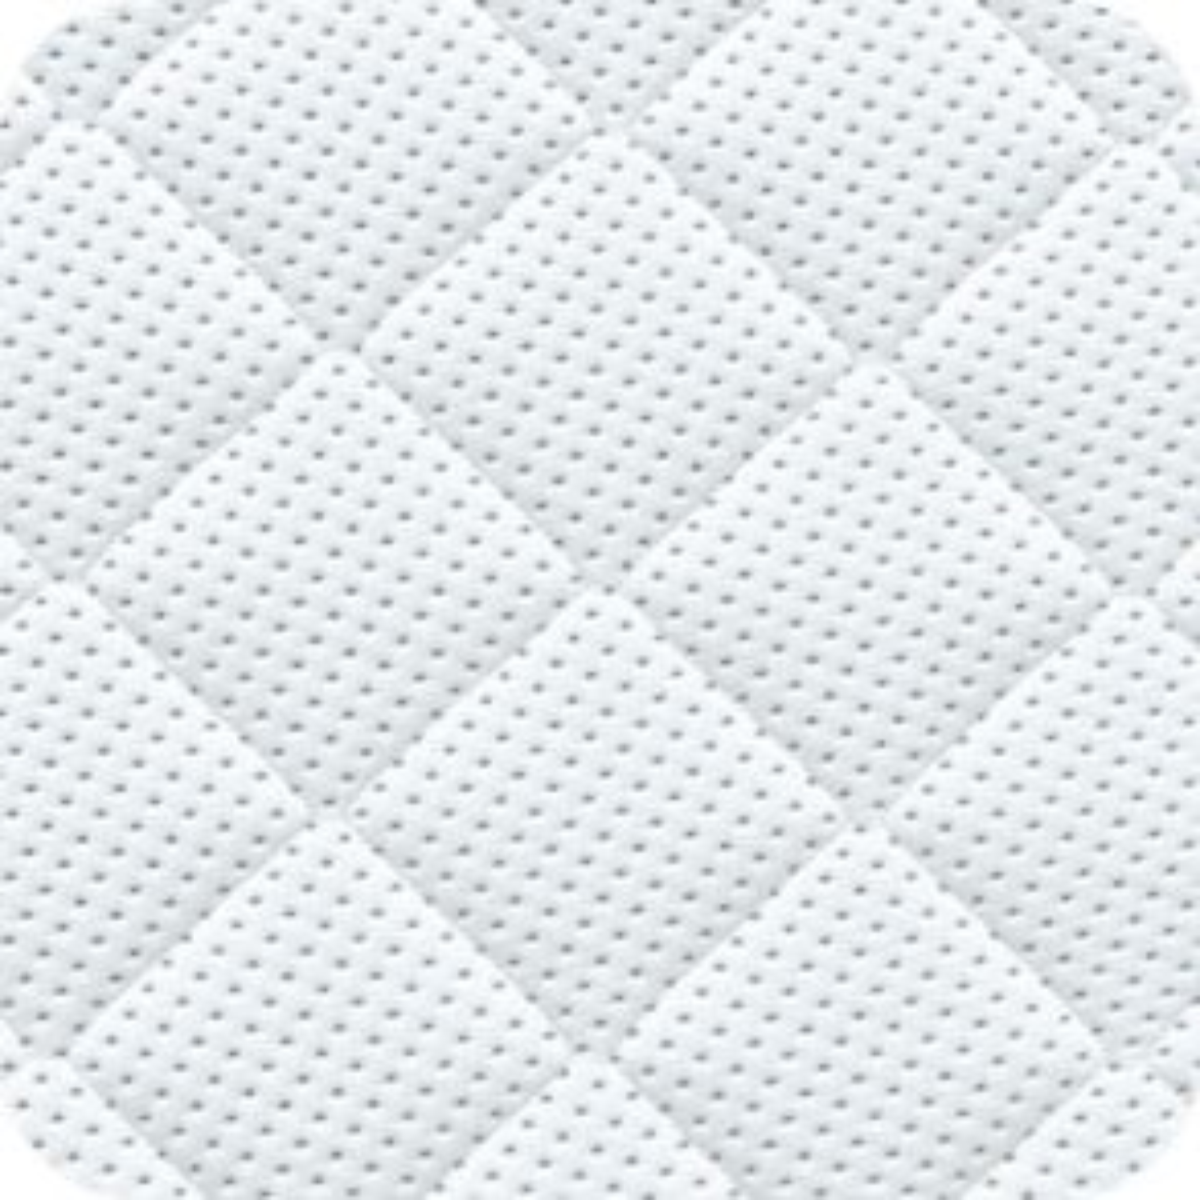 Pokrowiec na materac PIXEL 70x200